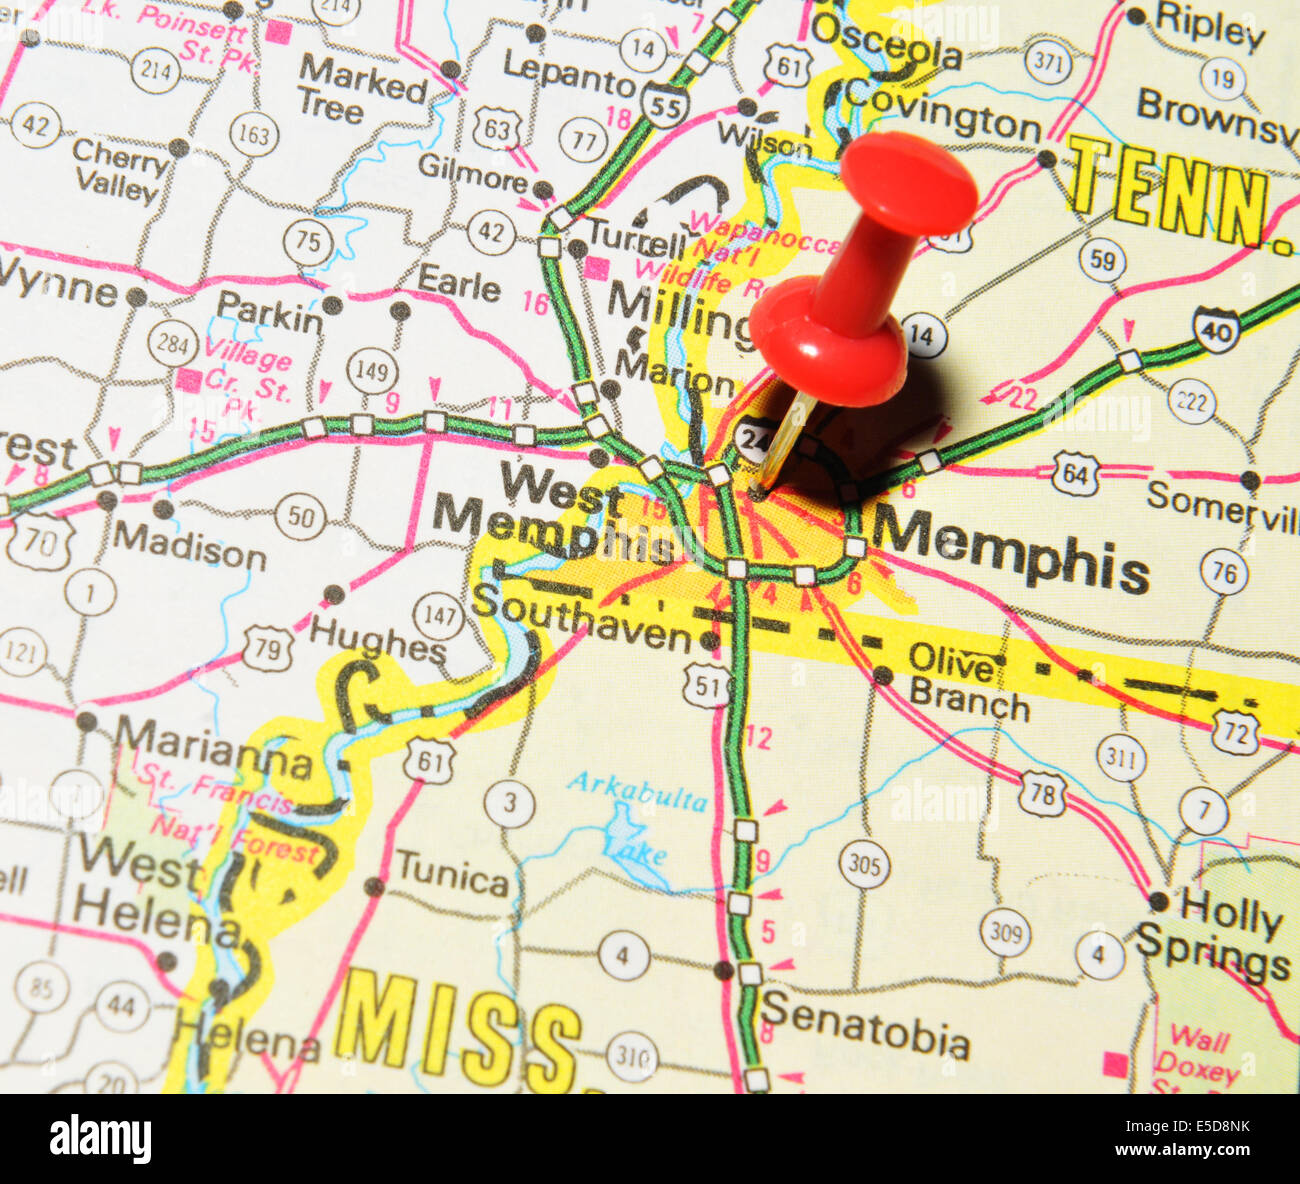 Memphis on US map Stock Photo Royalty Free Image 72207007 Alamy